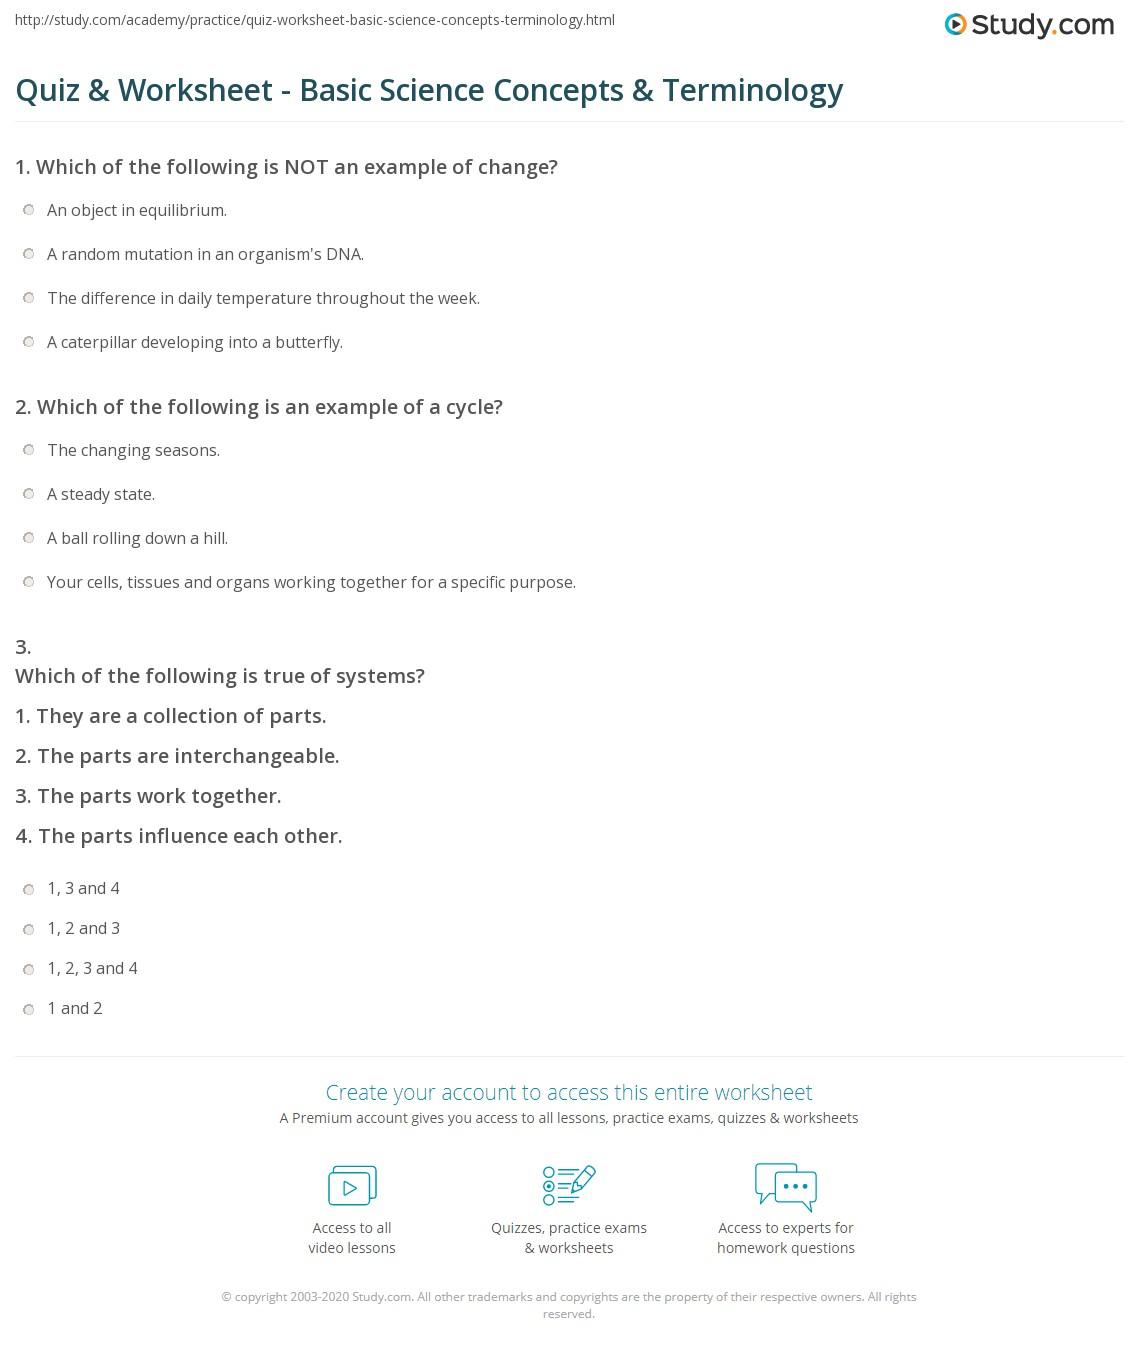 Worksheets Basic Science Worksheets quiz worksheet basic science concepts terminology study com print worksheet